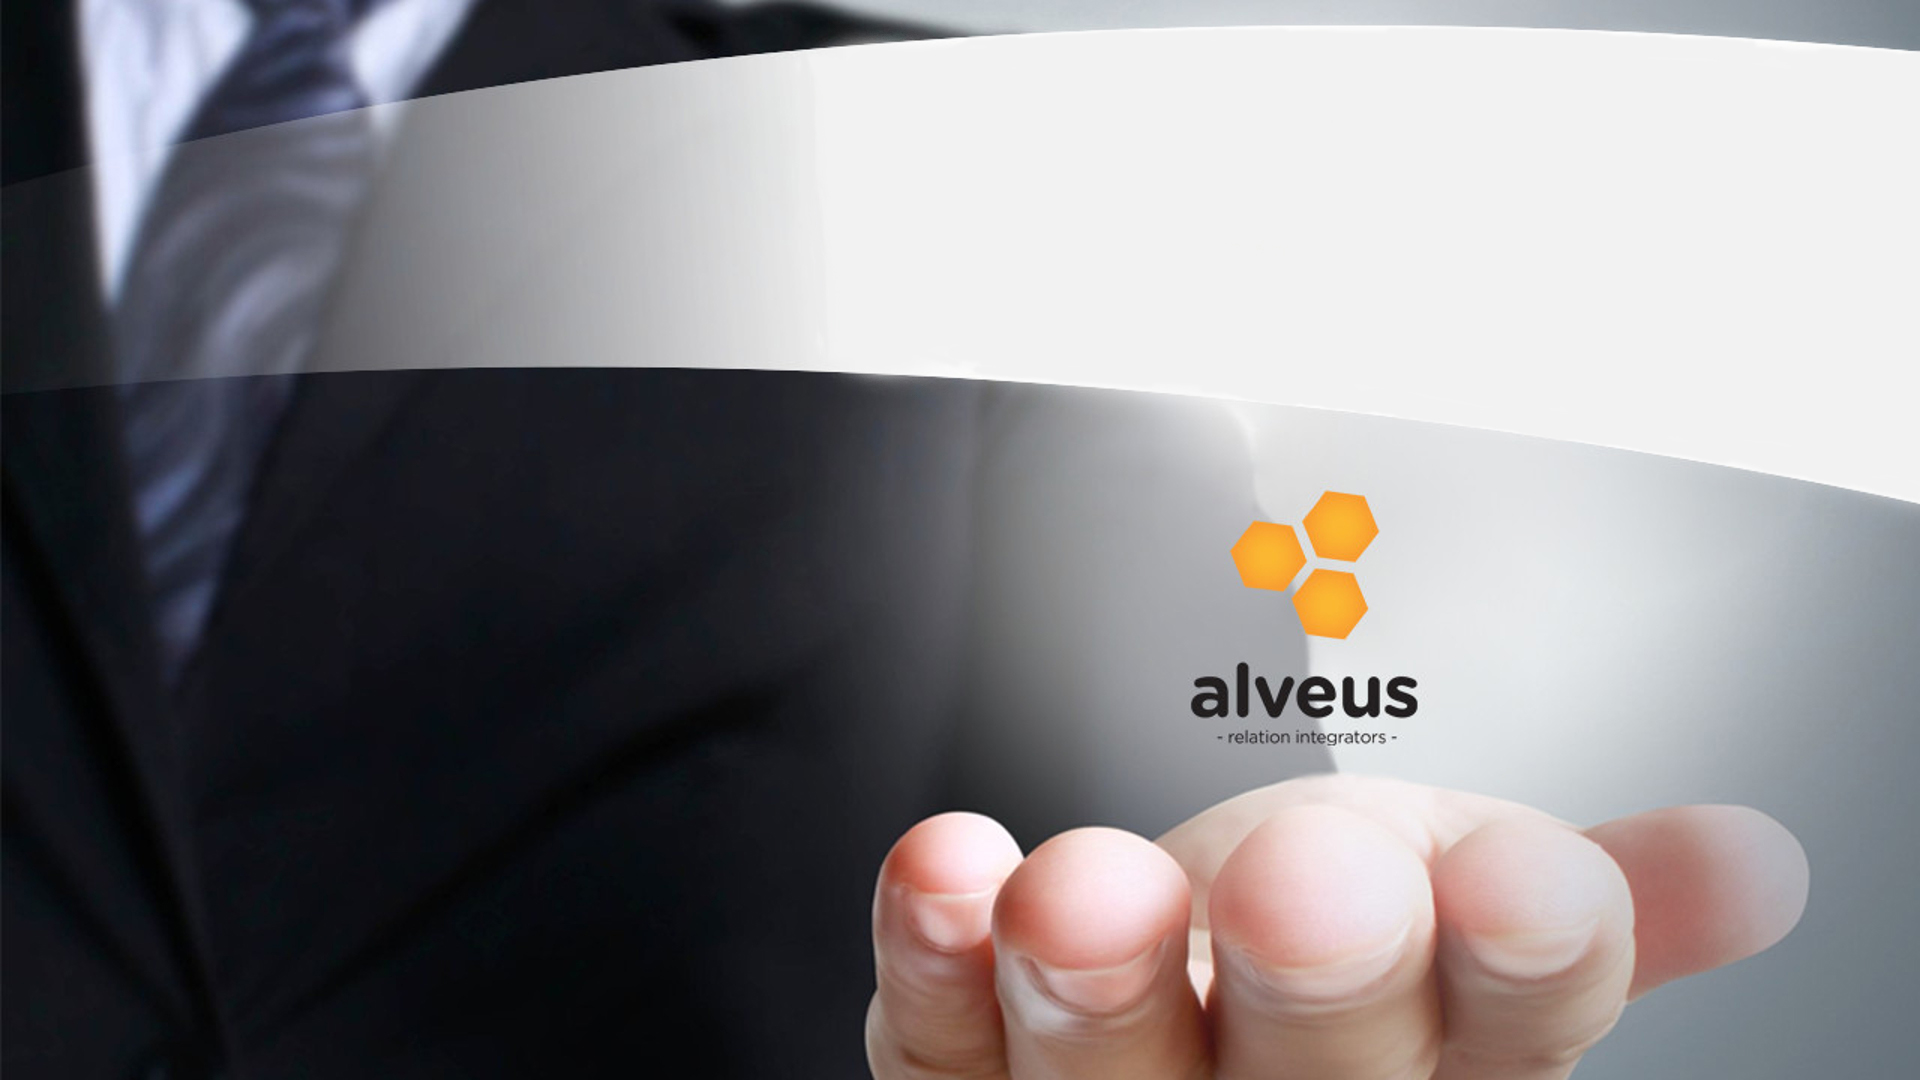 Alveus Group